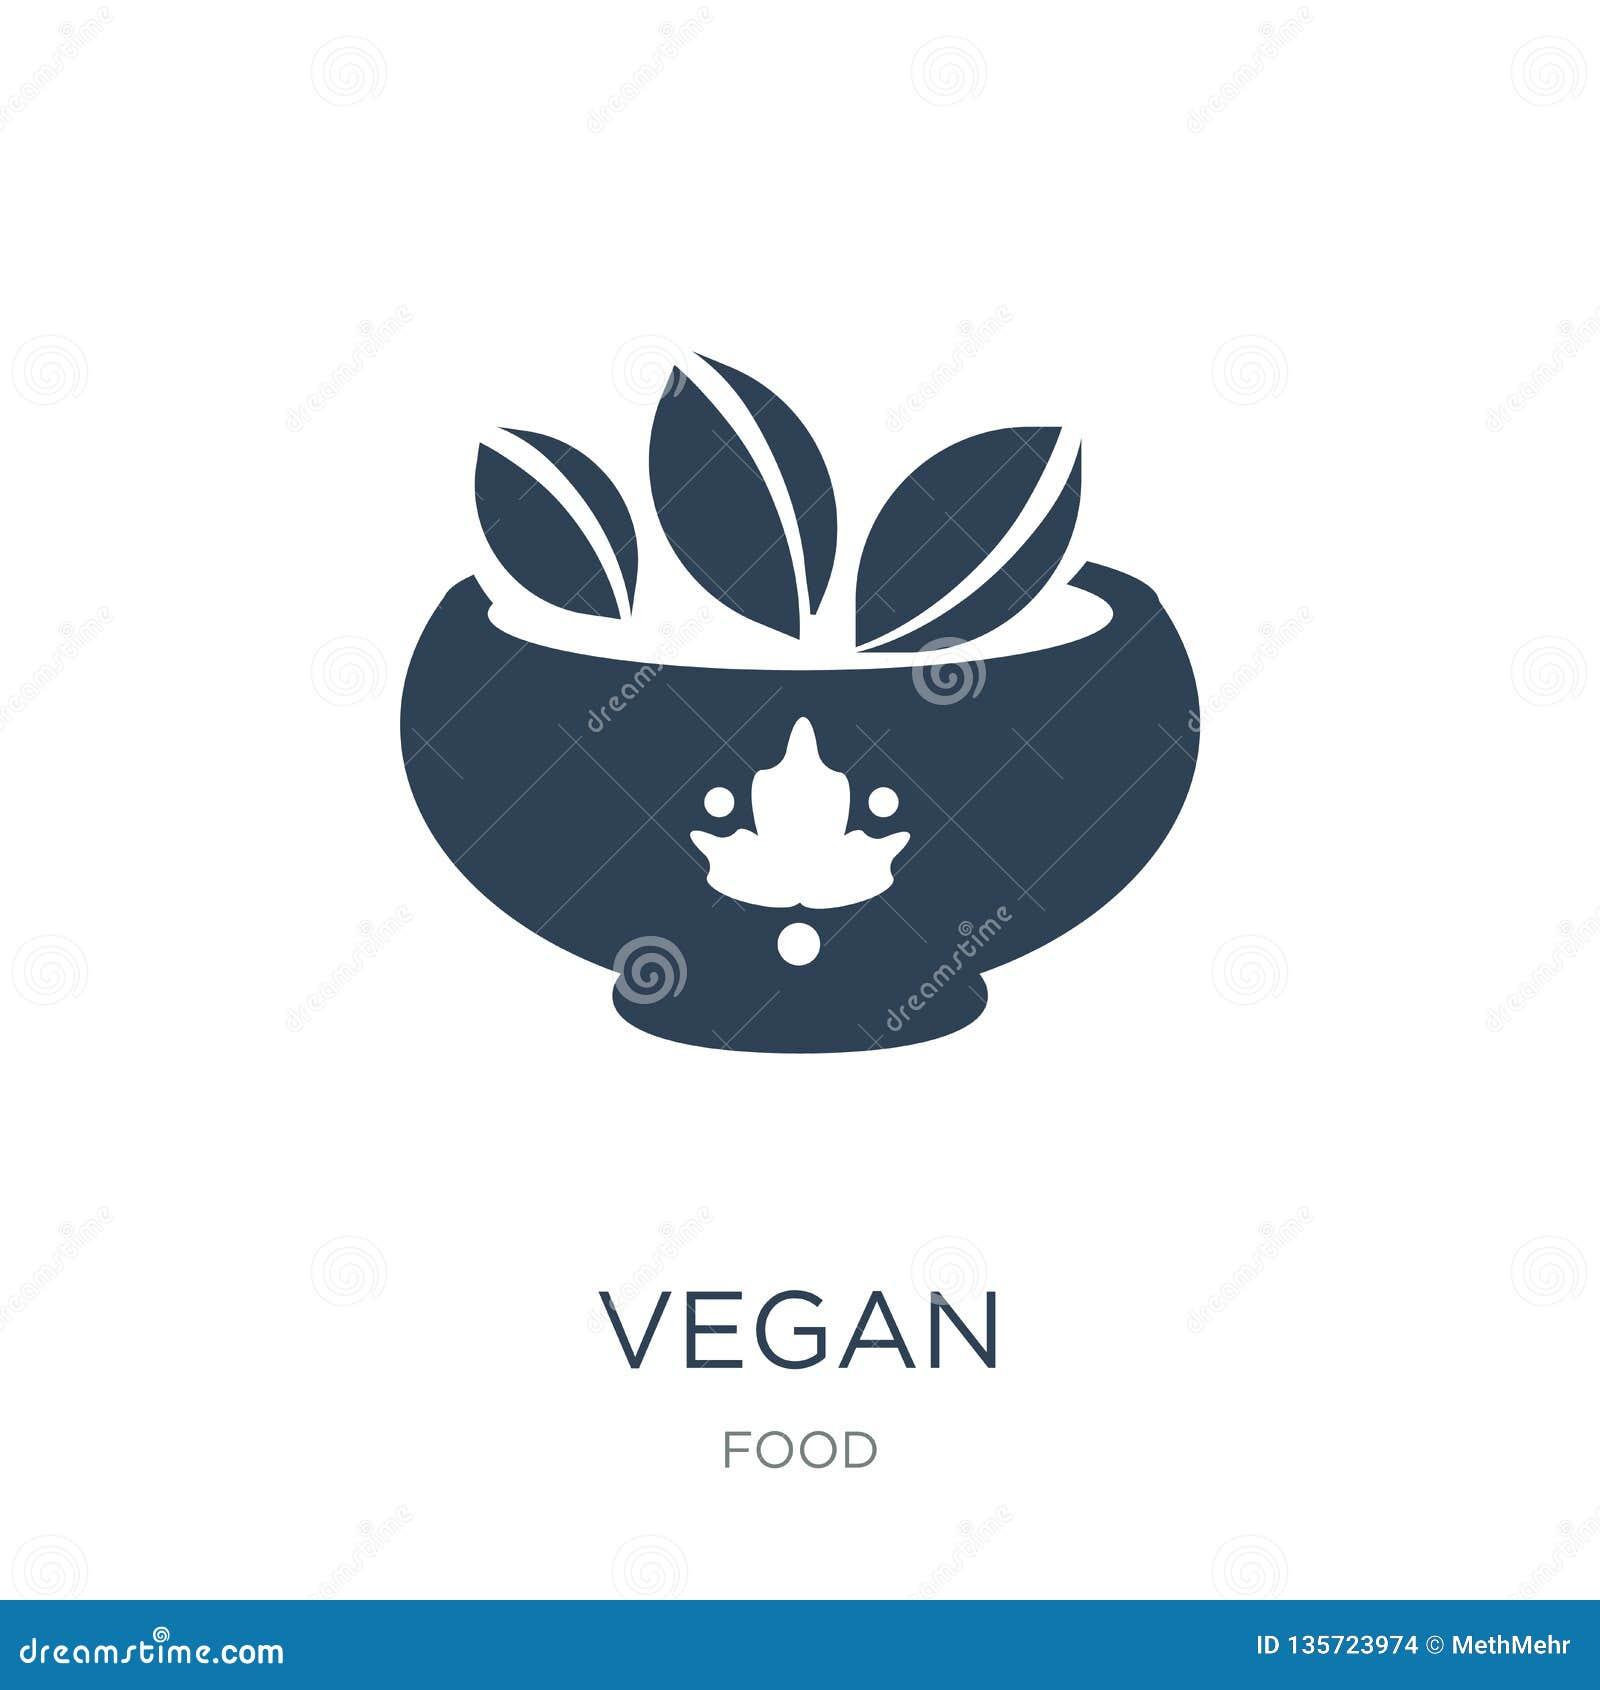 Vegan Icon In Trendy Design Style  Vegan Icon Isolated On White